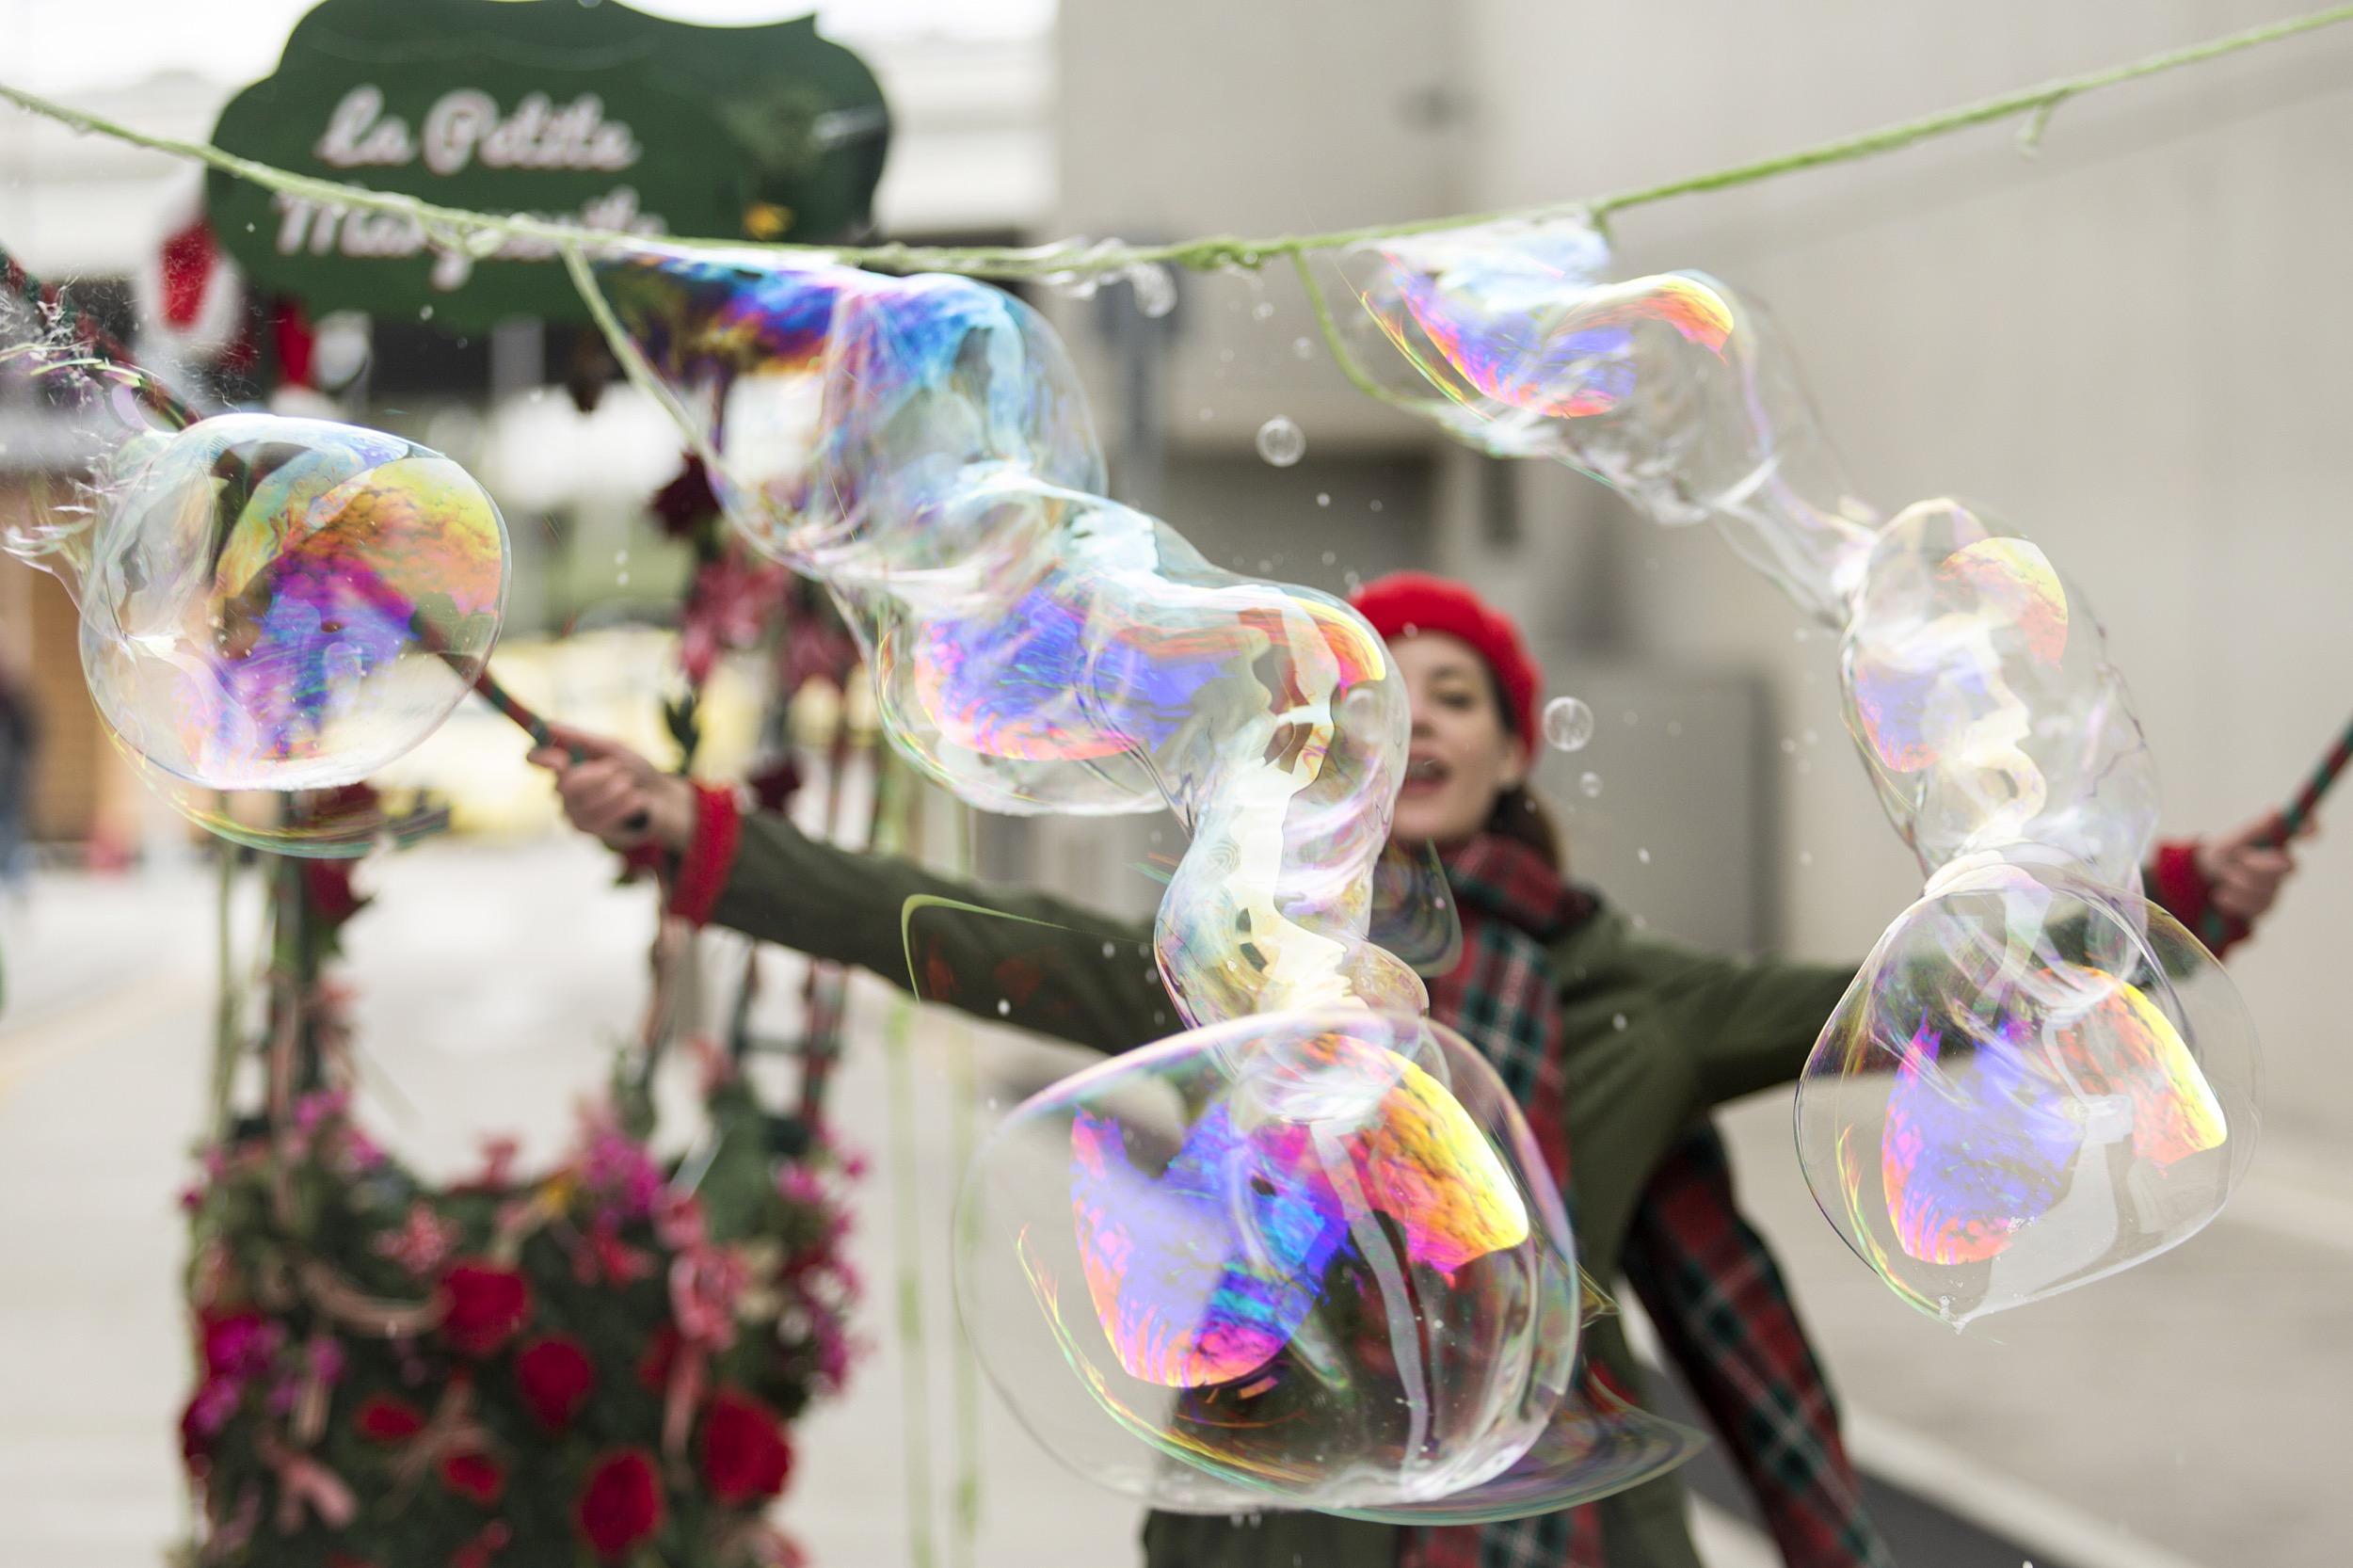 bubble parade στο κεντρο πολιτισμού ίδρυμα σταύρος νιάρχος